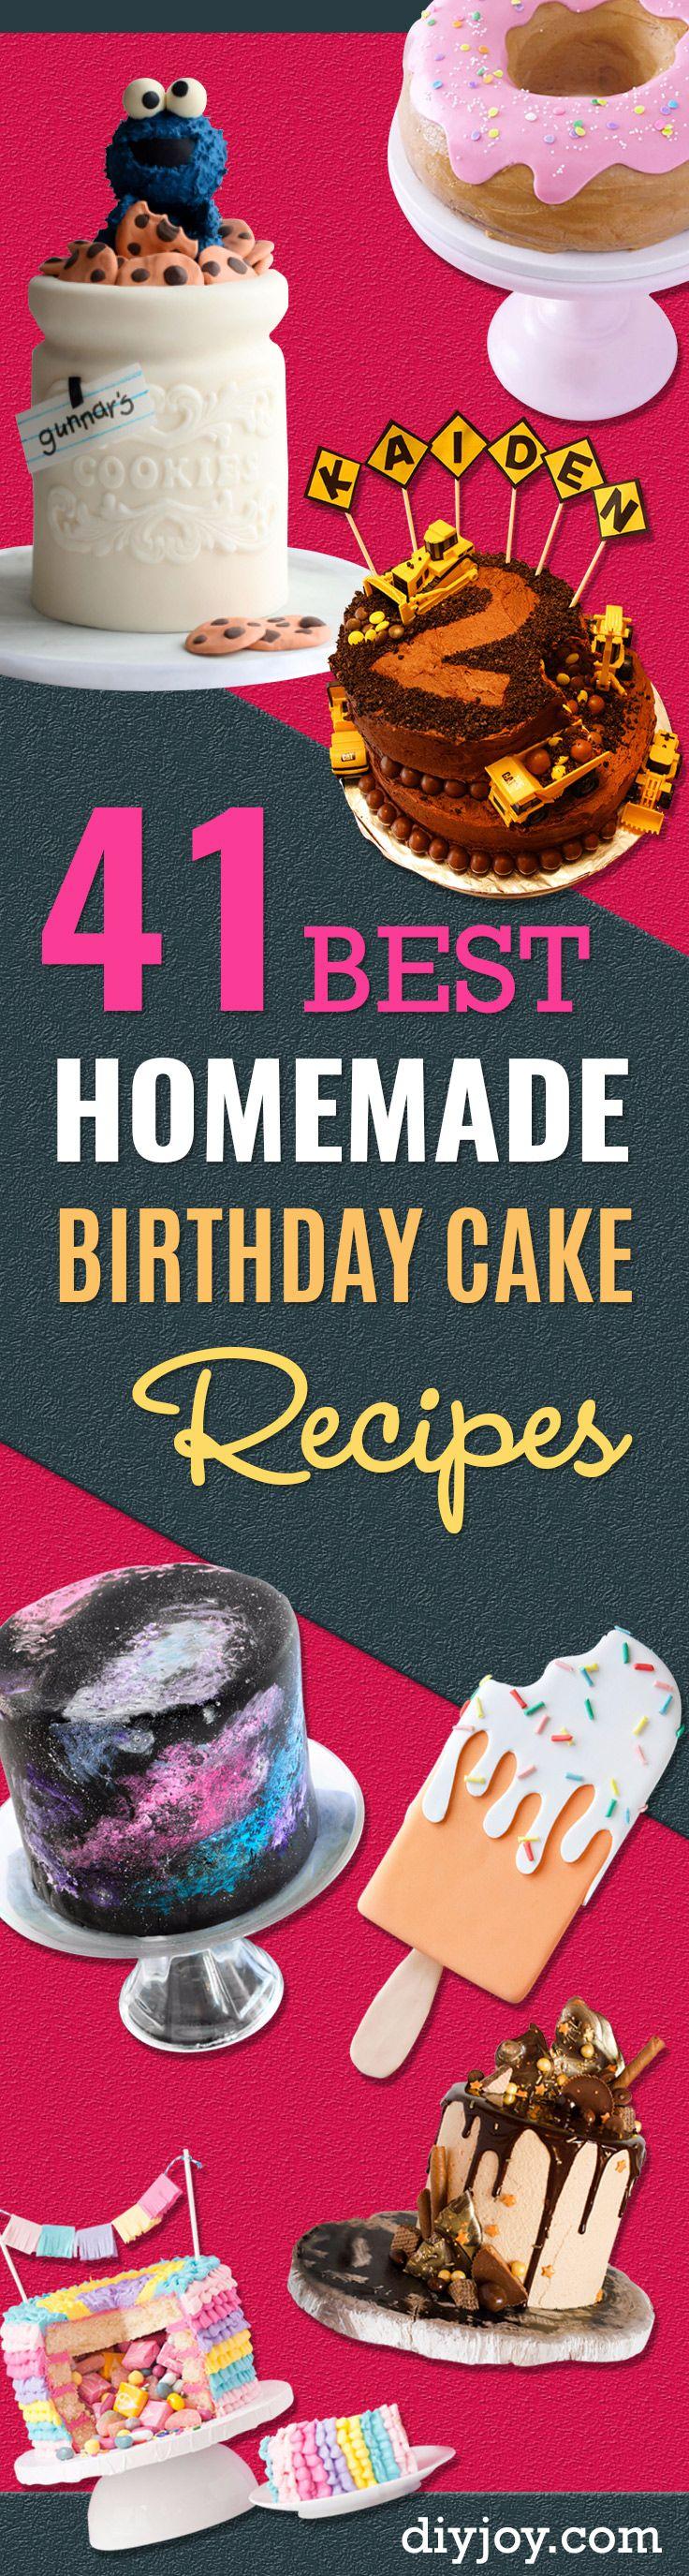 41 Best Homemade Birthday Cake Recipes Easy birthday cake